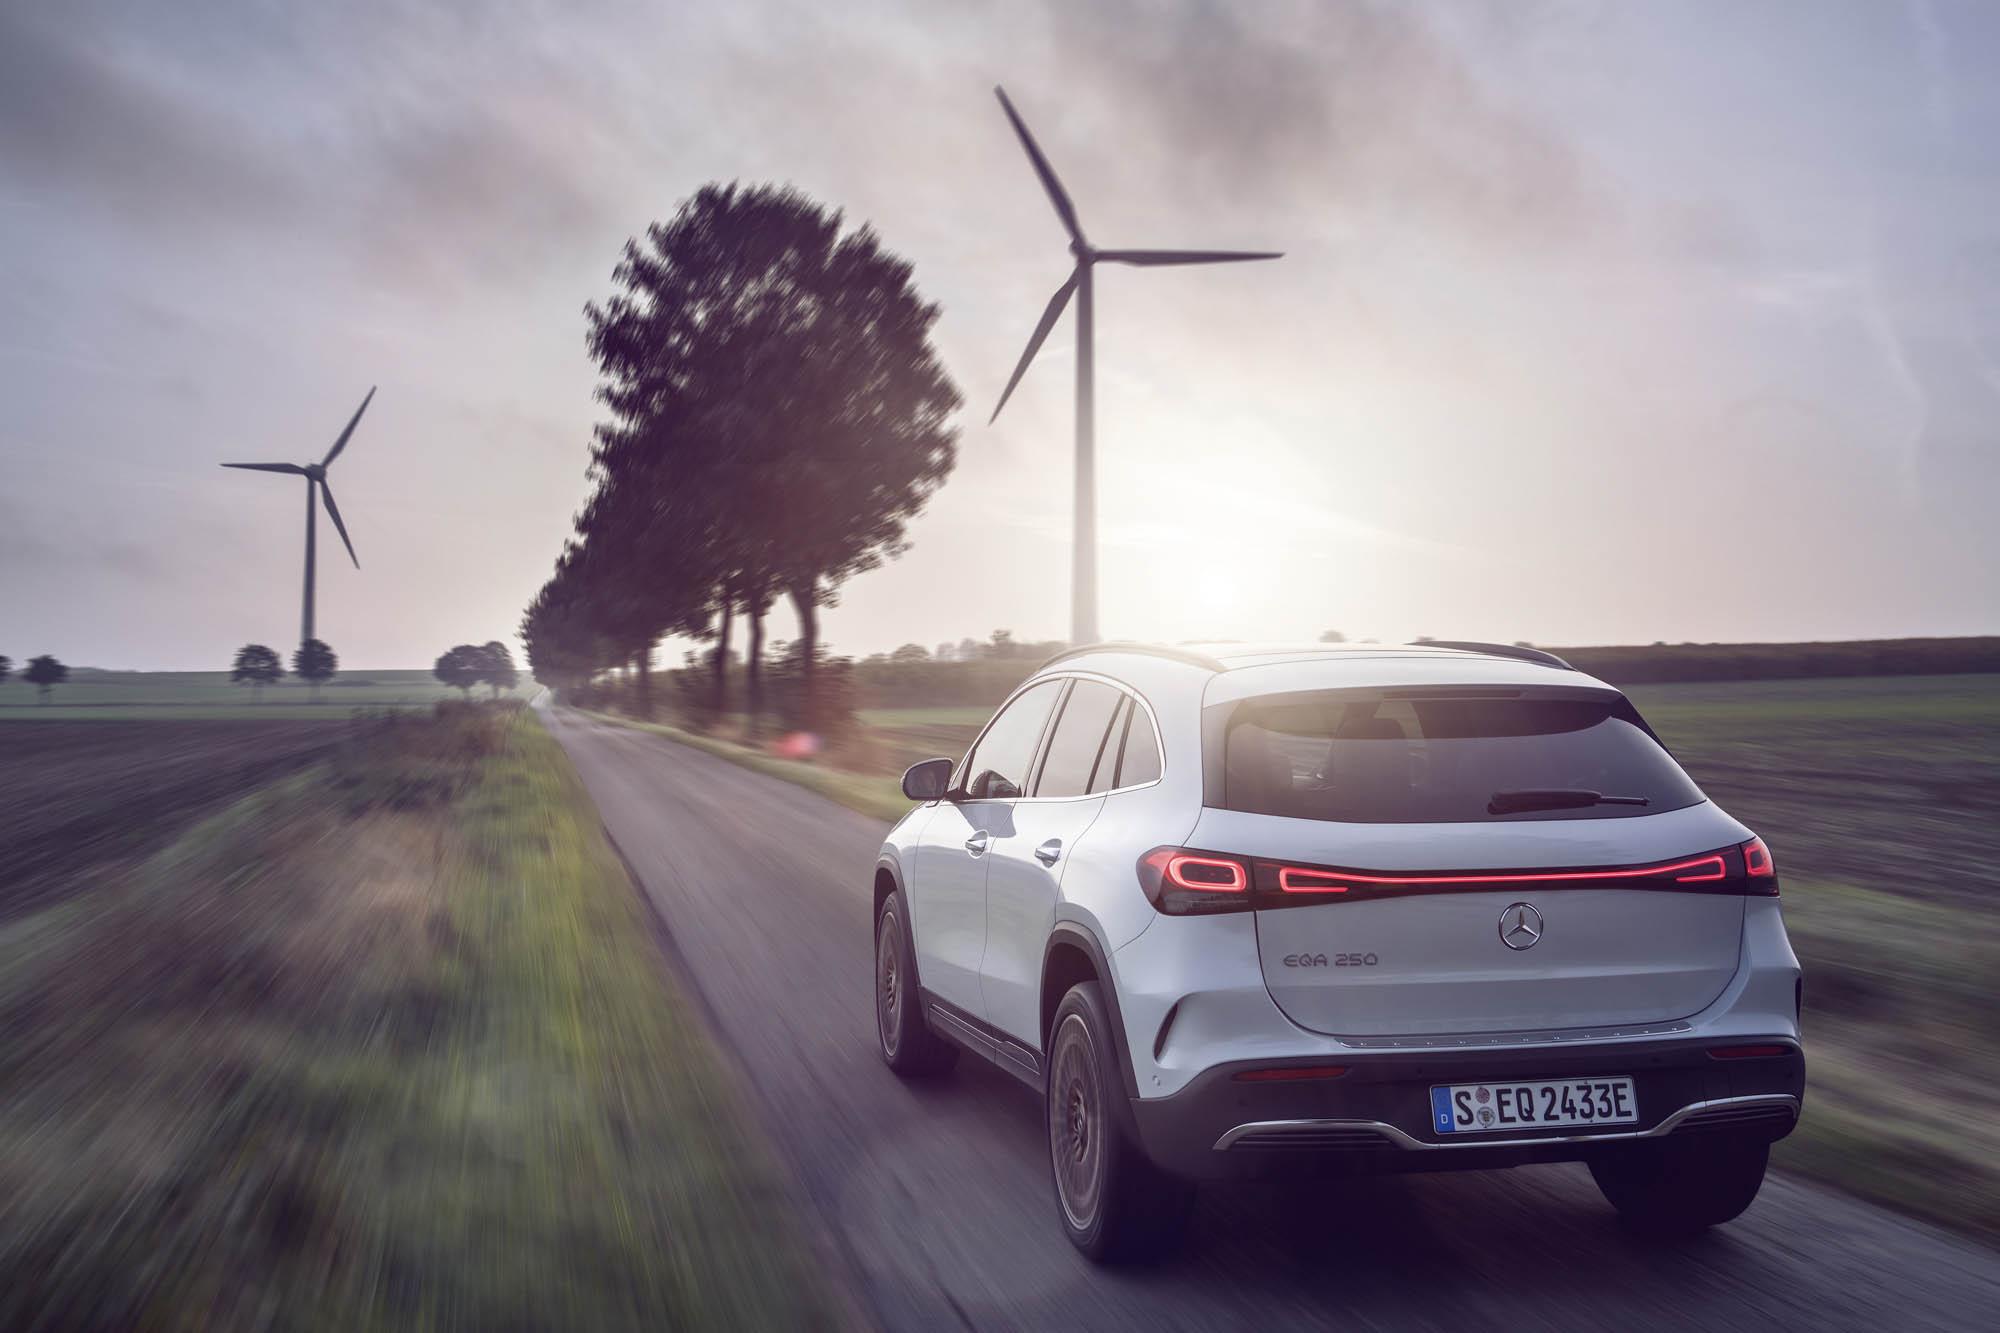 Mercedes-EQ, EQA 250, Edition 1, Fahraufnahme, digitalweiss. EQA 250 (Stromverbrauch kombiniert: 15,7 kWh/100 km; CO2-Emissionen kombiniert: 0 g/km);Stromverbrauch kombiniert: 15,7 kWh/100 km; CO2-Emissionen kombiniert: 0 g/km*  Mercedes-EQ, EQA 250, Edition 1, driving shot, digital white. EQA 250 (combined power consumption: 15.7 kWh/100 km, combined CO2 emissions: 0 g/km);Combined power consumption: 15.7 kWh/100 km, combined CO2 emissions: 0 g/km*